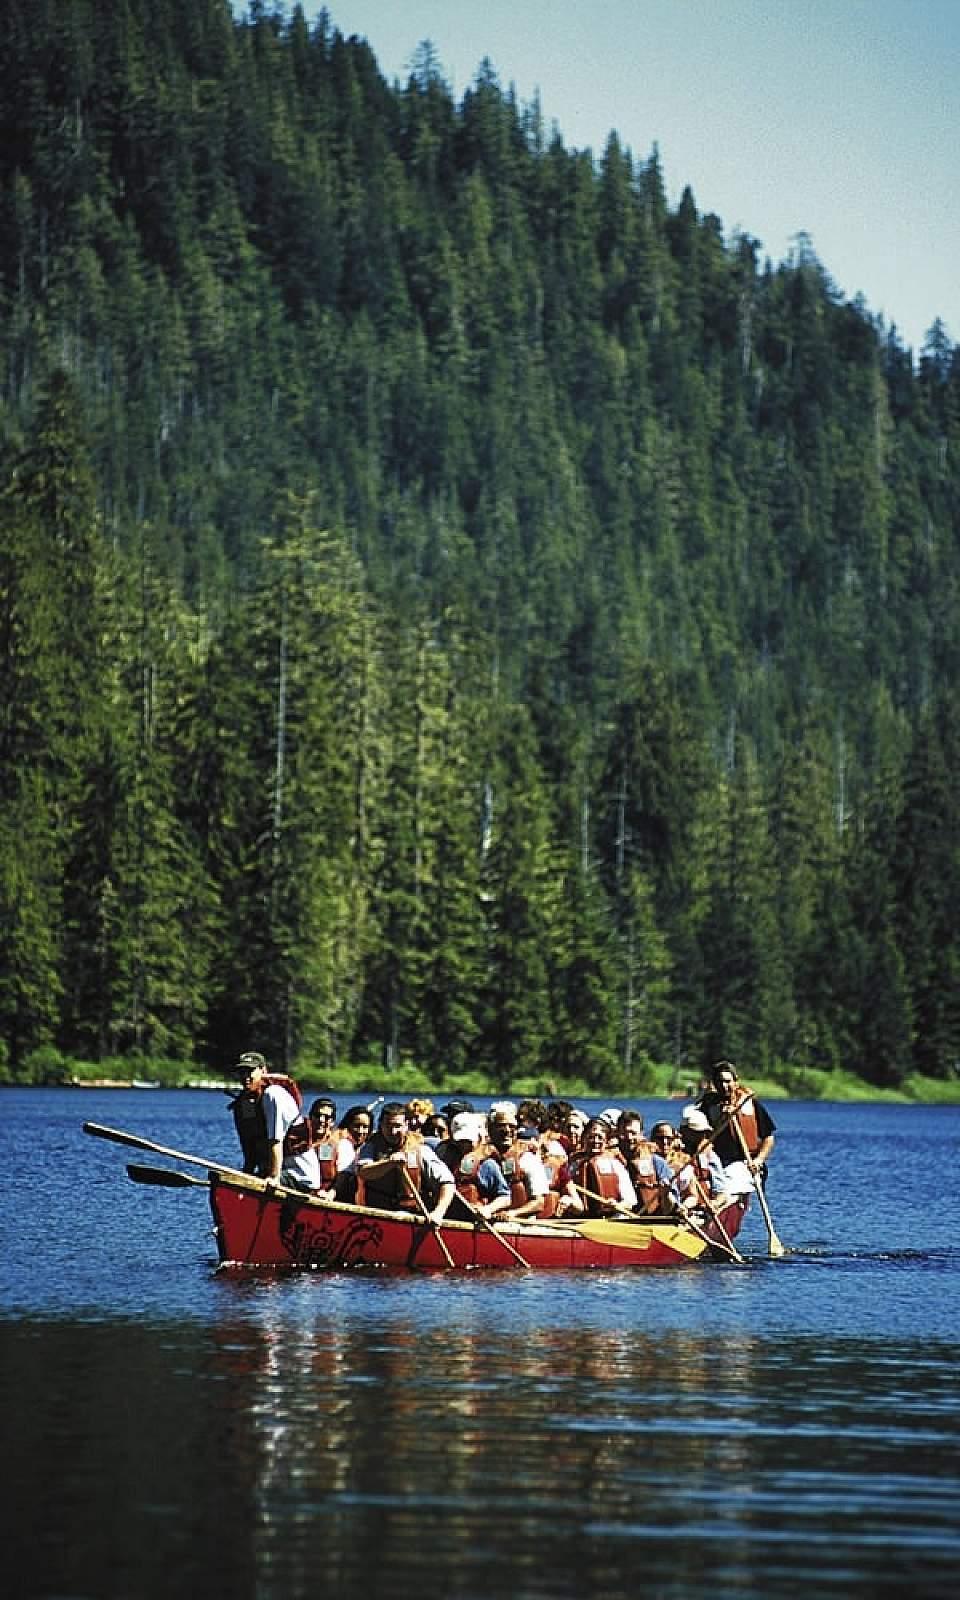 Paddle across a serene alpine lake in a traditional Alaska Native-style canoe